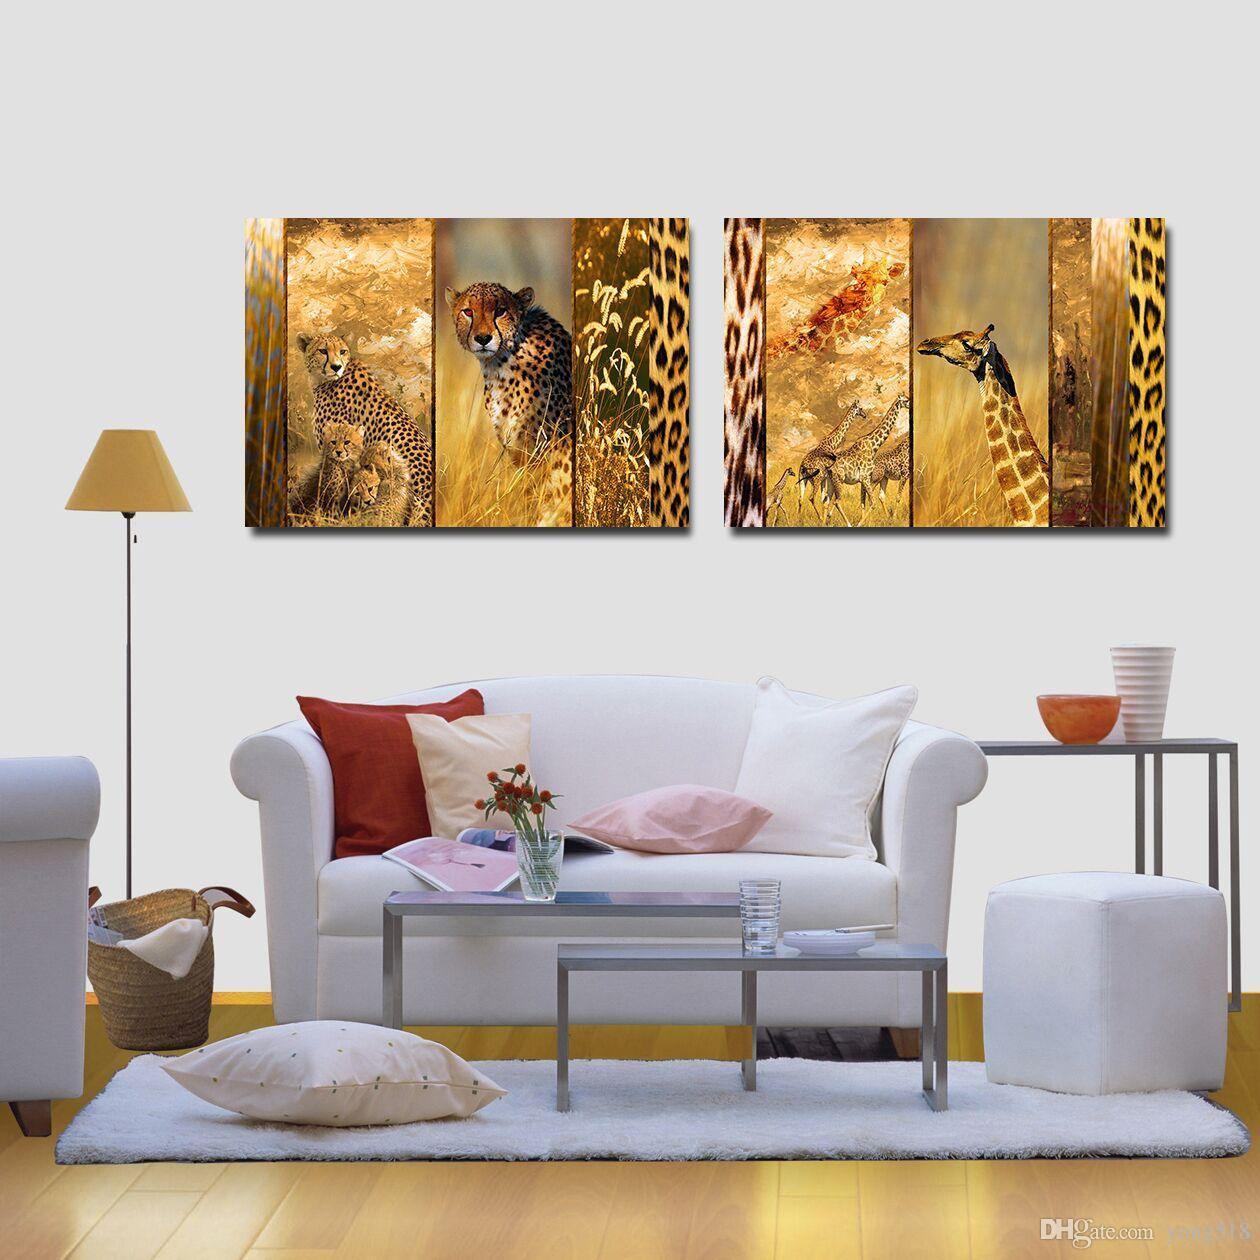 Leopard giraffe Leinwand Ungerahmt Foto Abstrakt Modern Home Decor Wandkunst Leinwand Safari Park Tier Bild Drucken Malerei